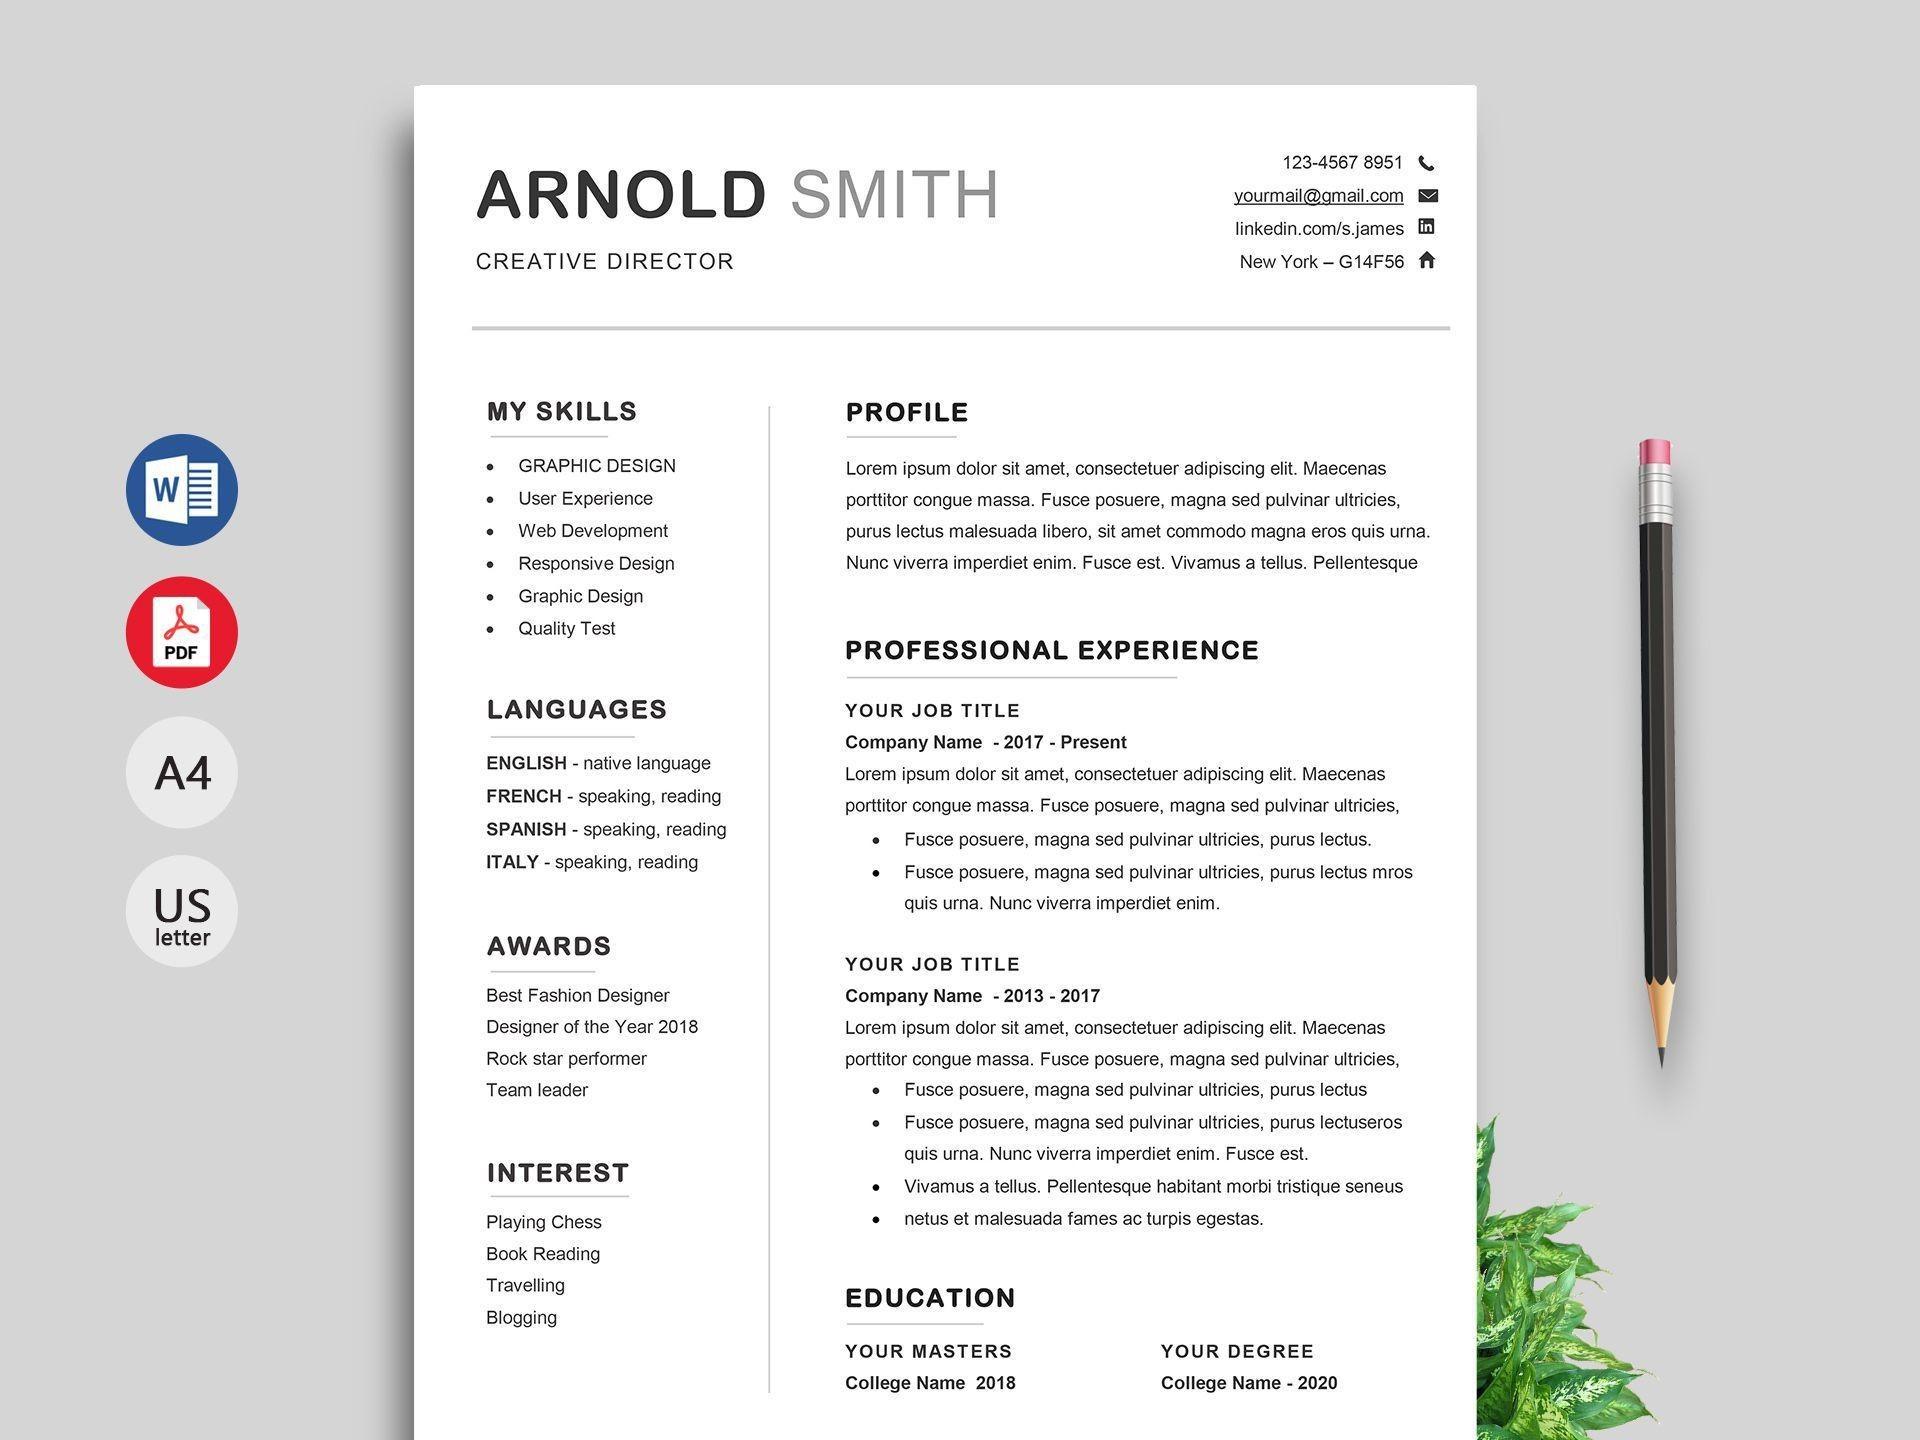 000 Impressive Professional Resume Template 2018 Free Download Idea 1920